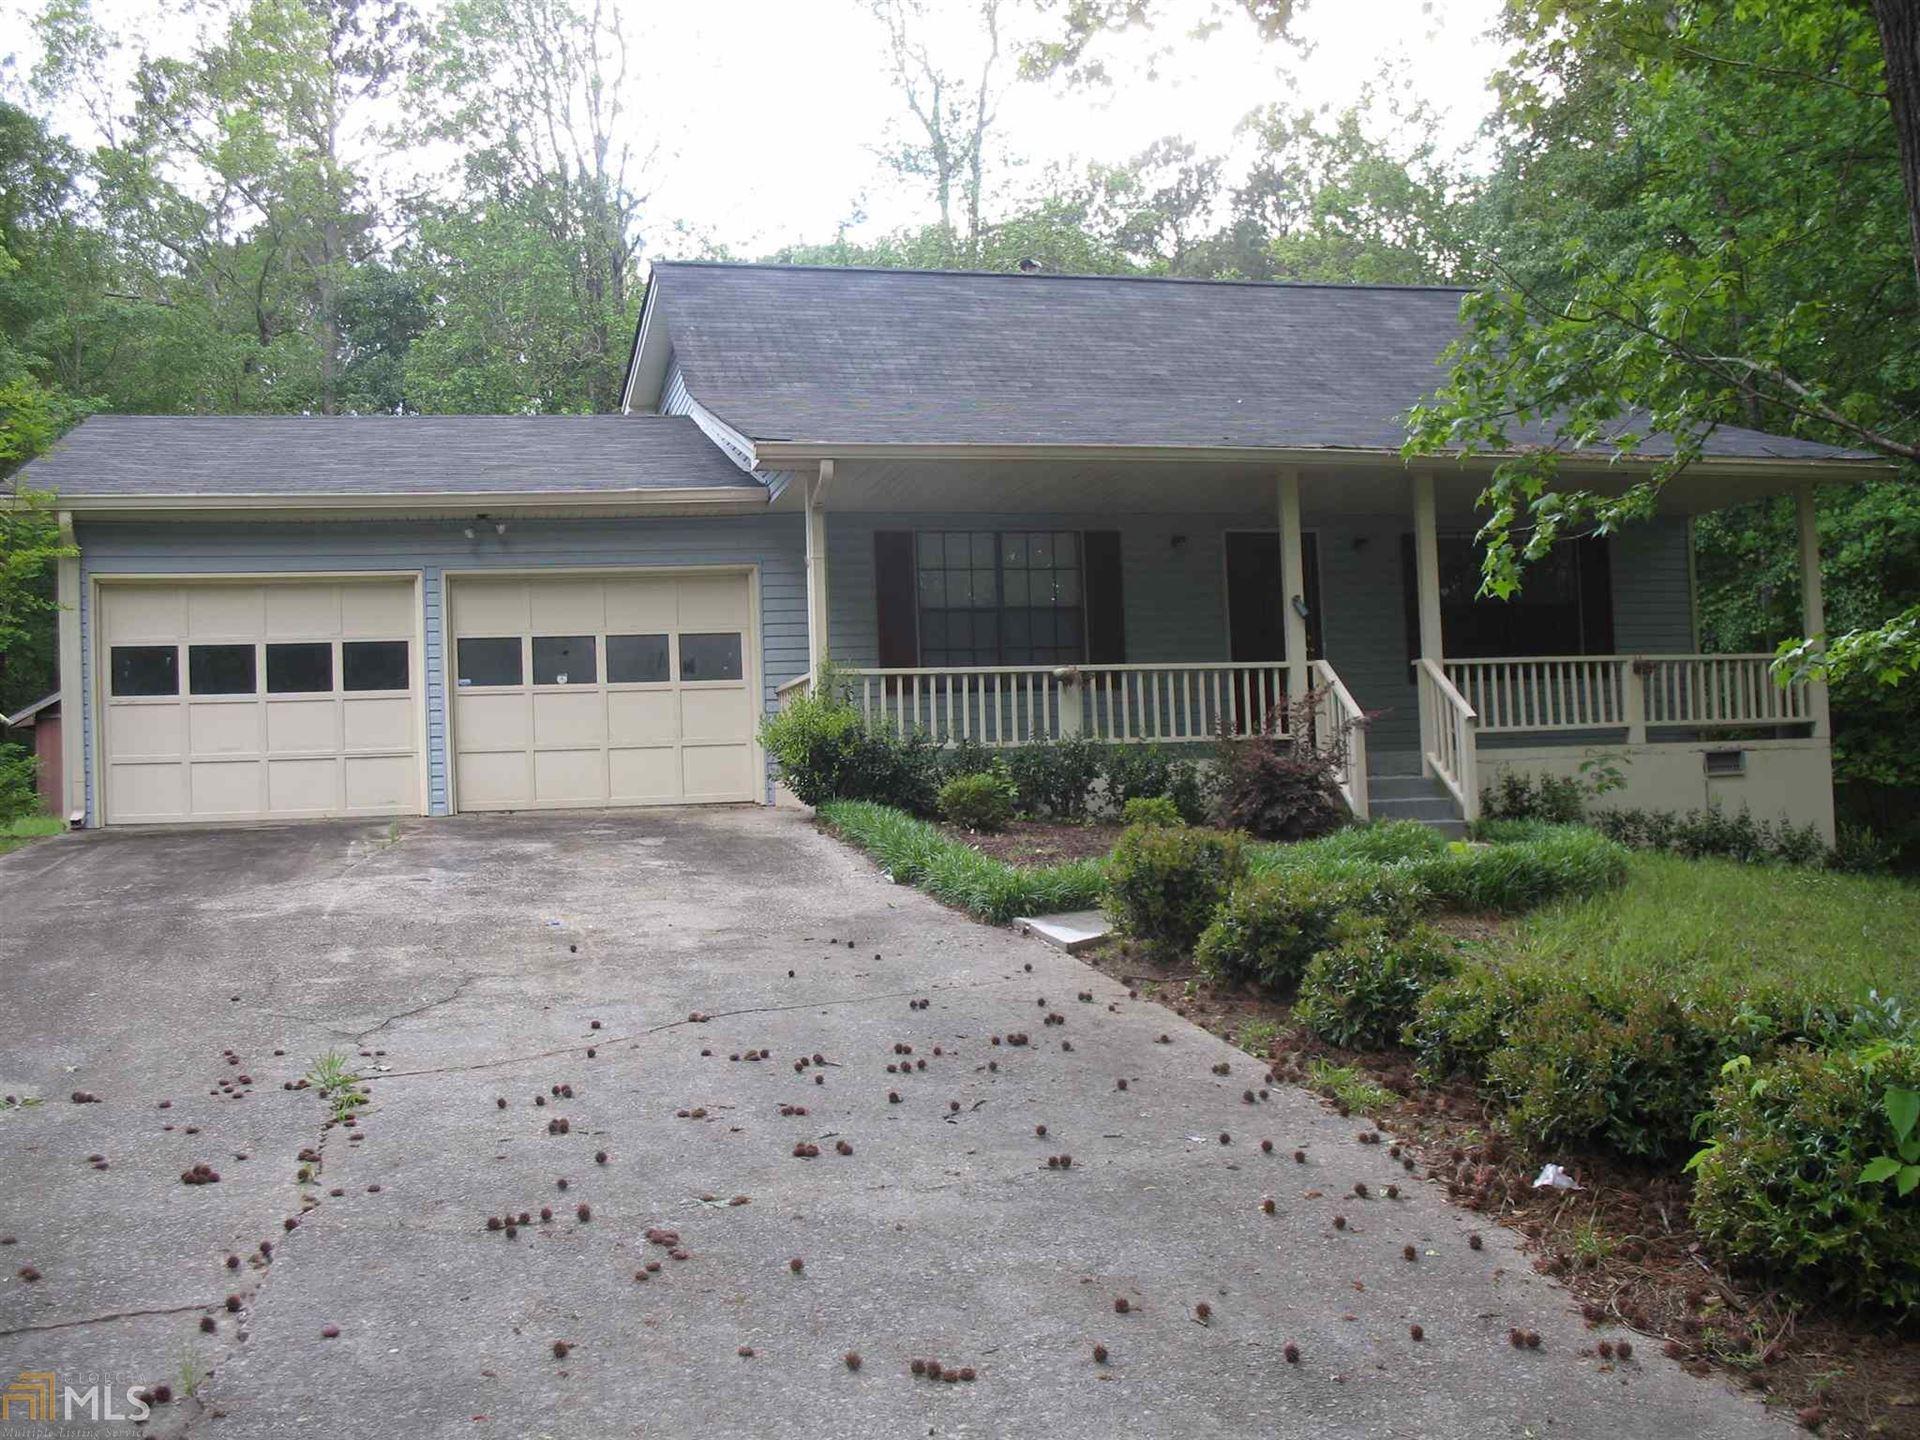 4629 SE S Woodlake Ln, Conyers, GA 30013 - #: 8765702